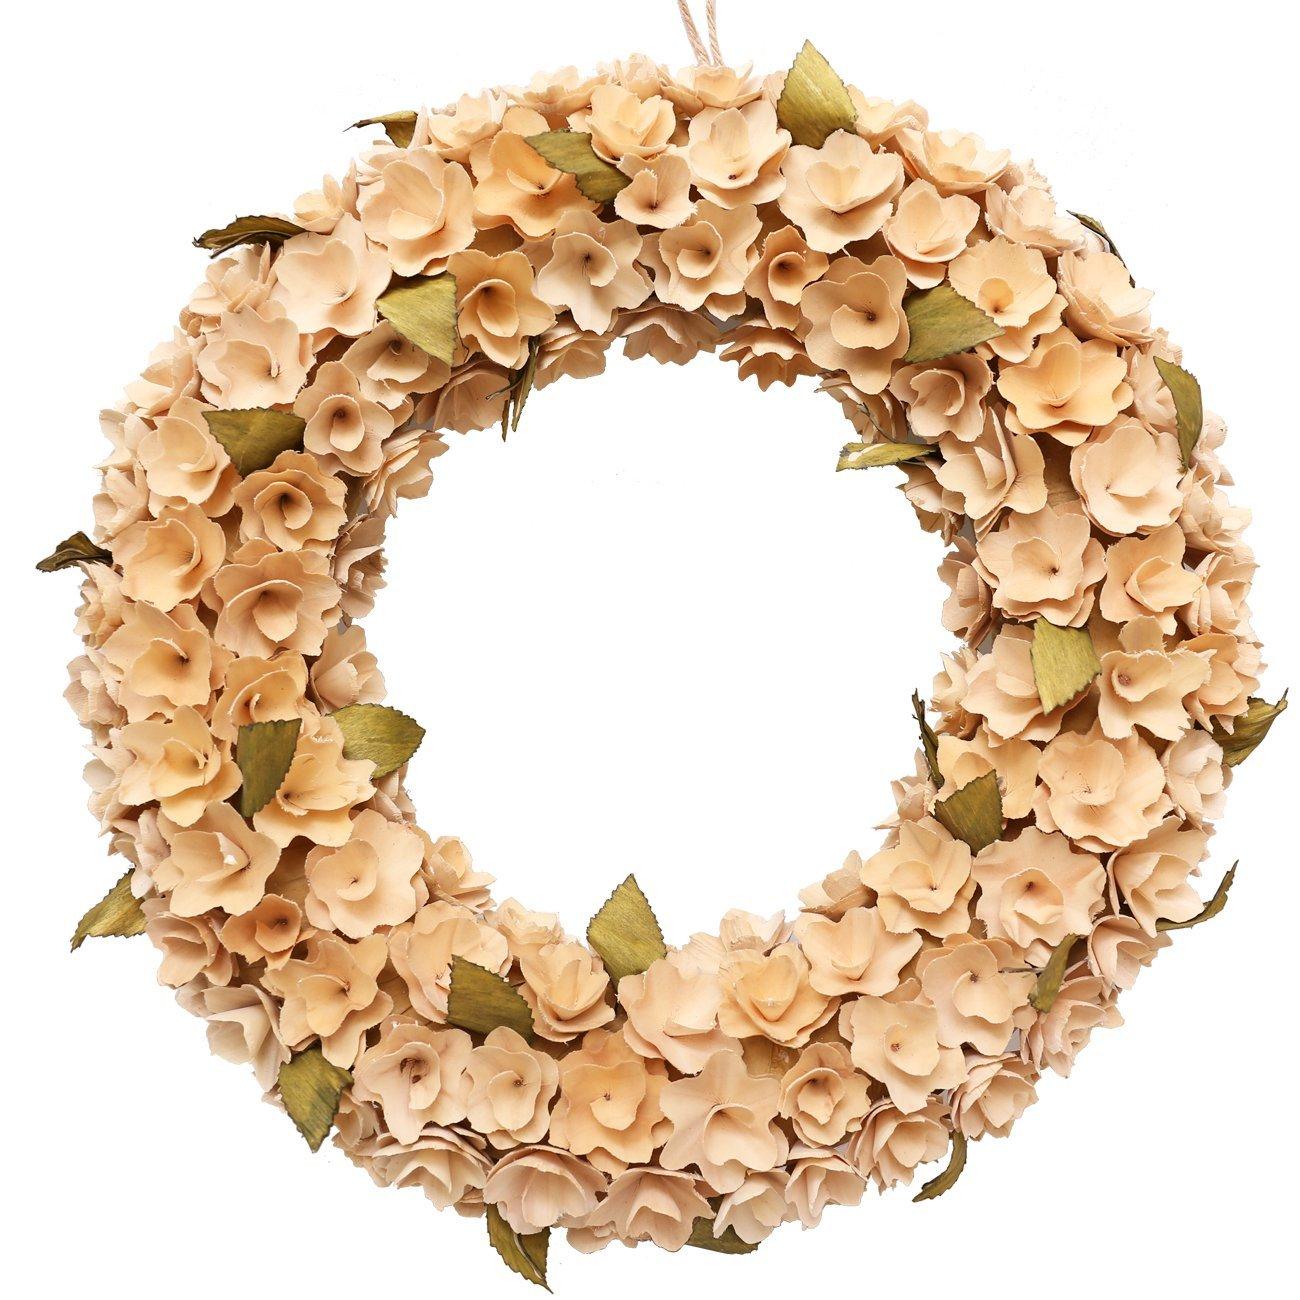 Boxwood Festival Wreath - $46.99